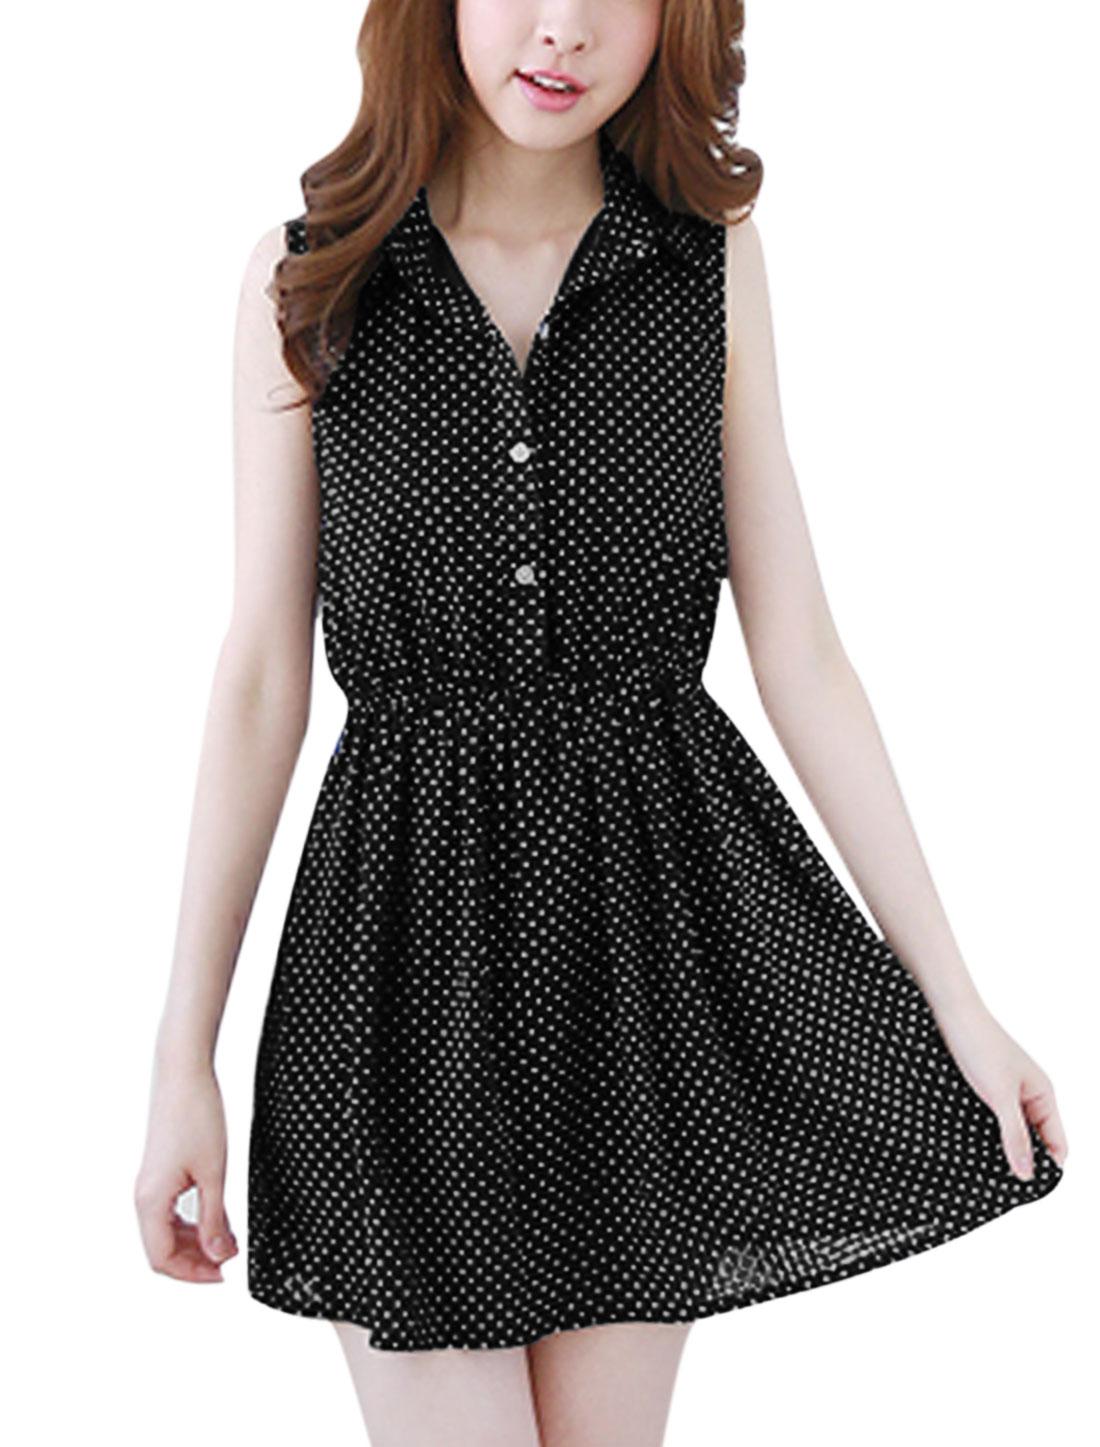 Women Dots Prints Slipover Button Upper Elastic Waist Shirt Dress Black M